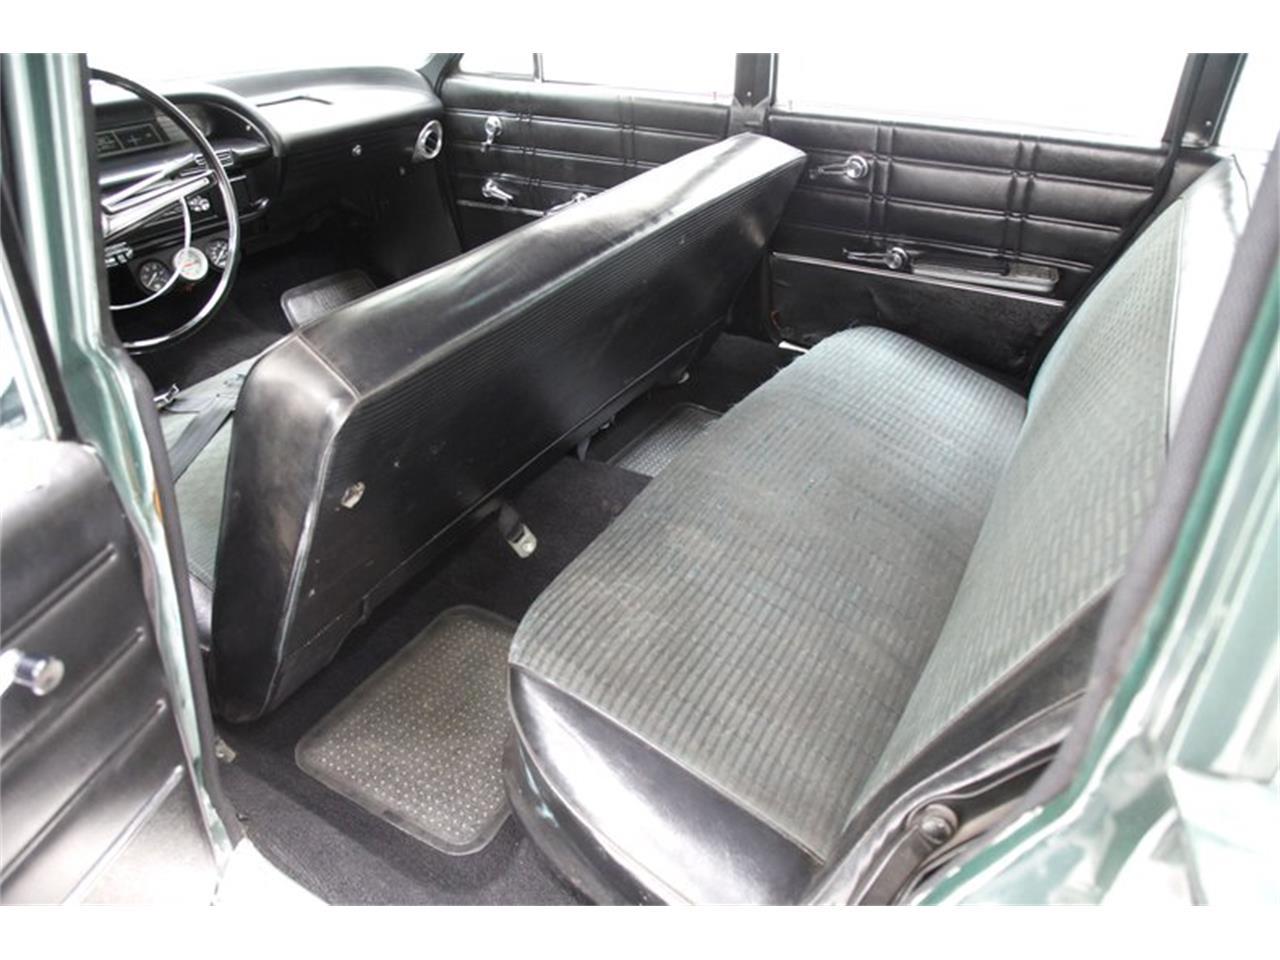 1963 Chevrolet Bel Air (CC-1416028) for sale in Morgantown, Pennsylvania